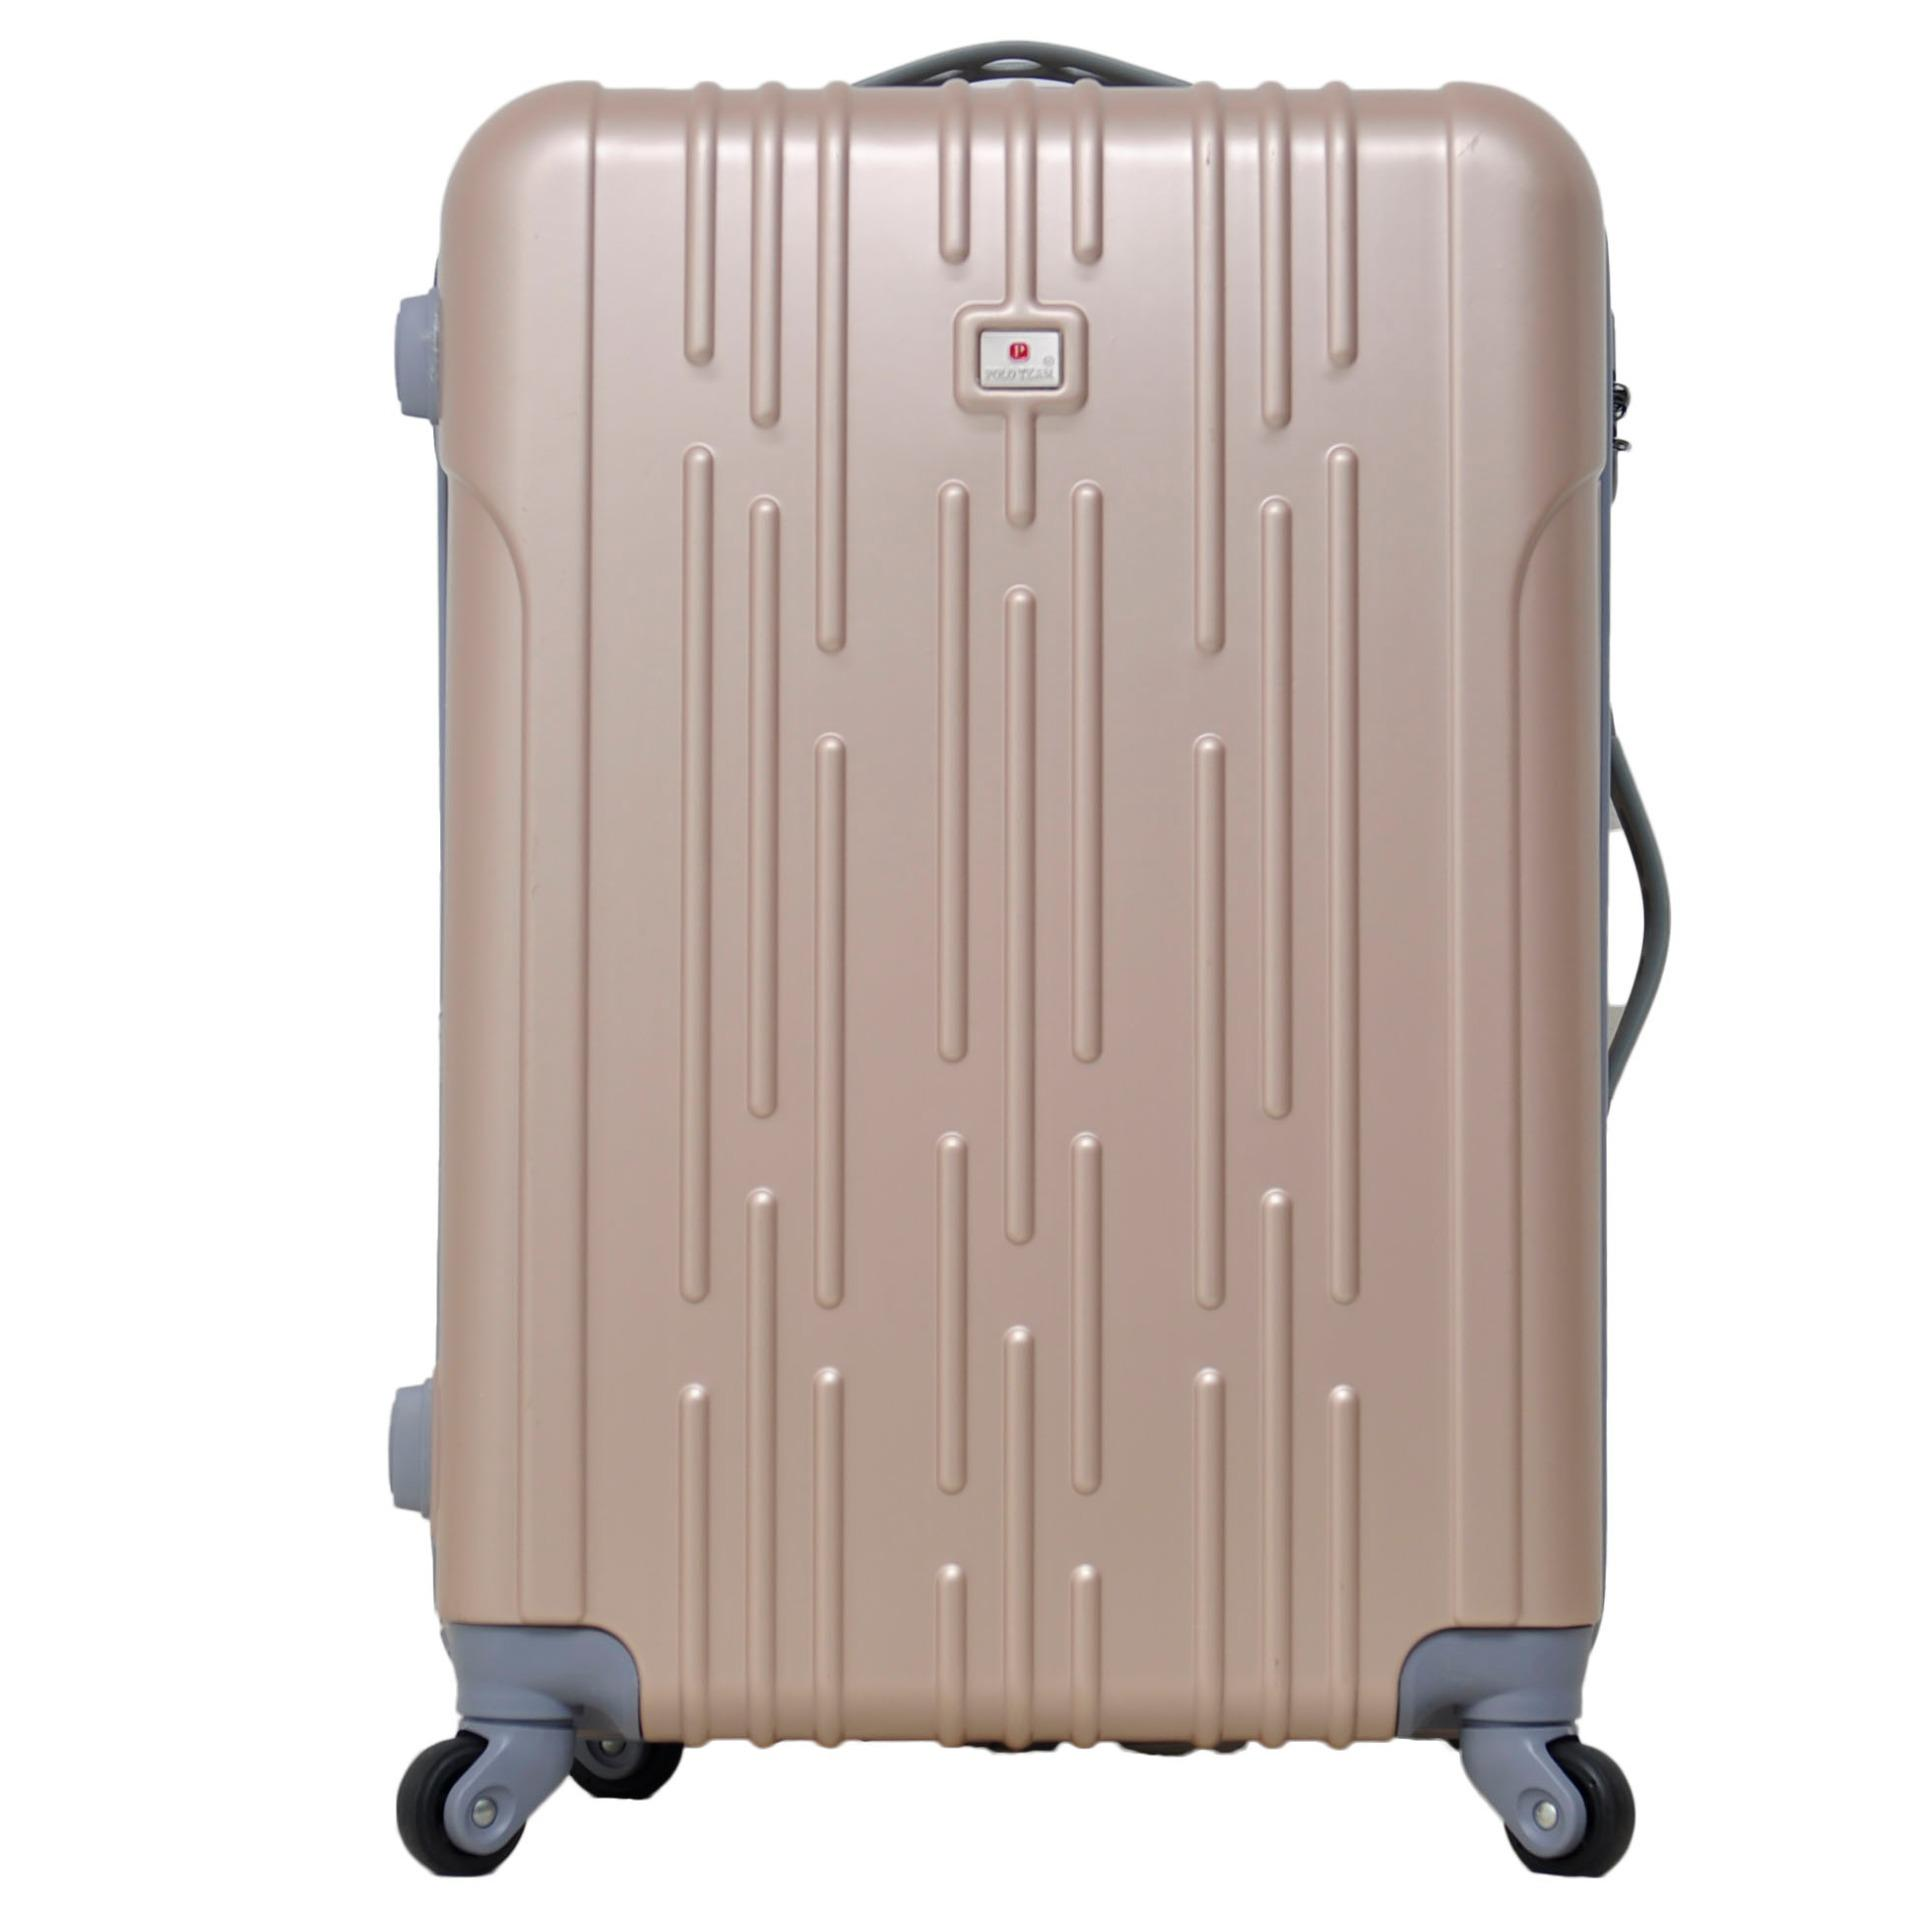 Beli Polo Team Tas Koper Hardcase Size 24 Inch 005 Cokelat Gold Kredit